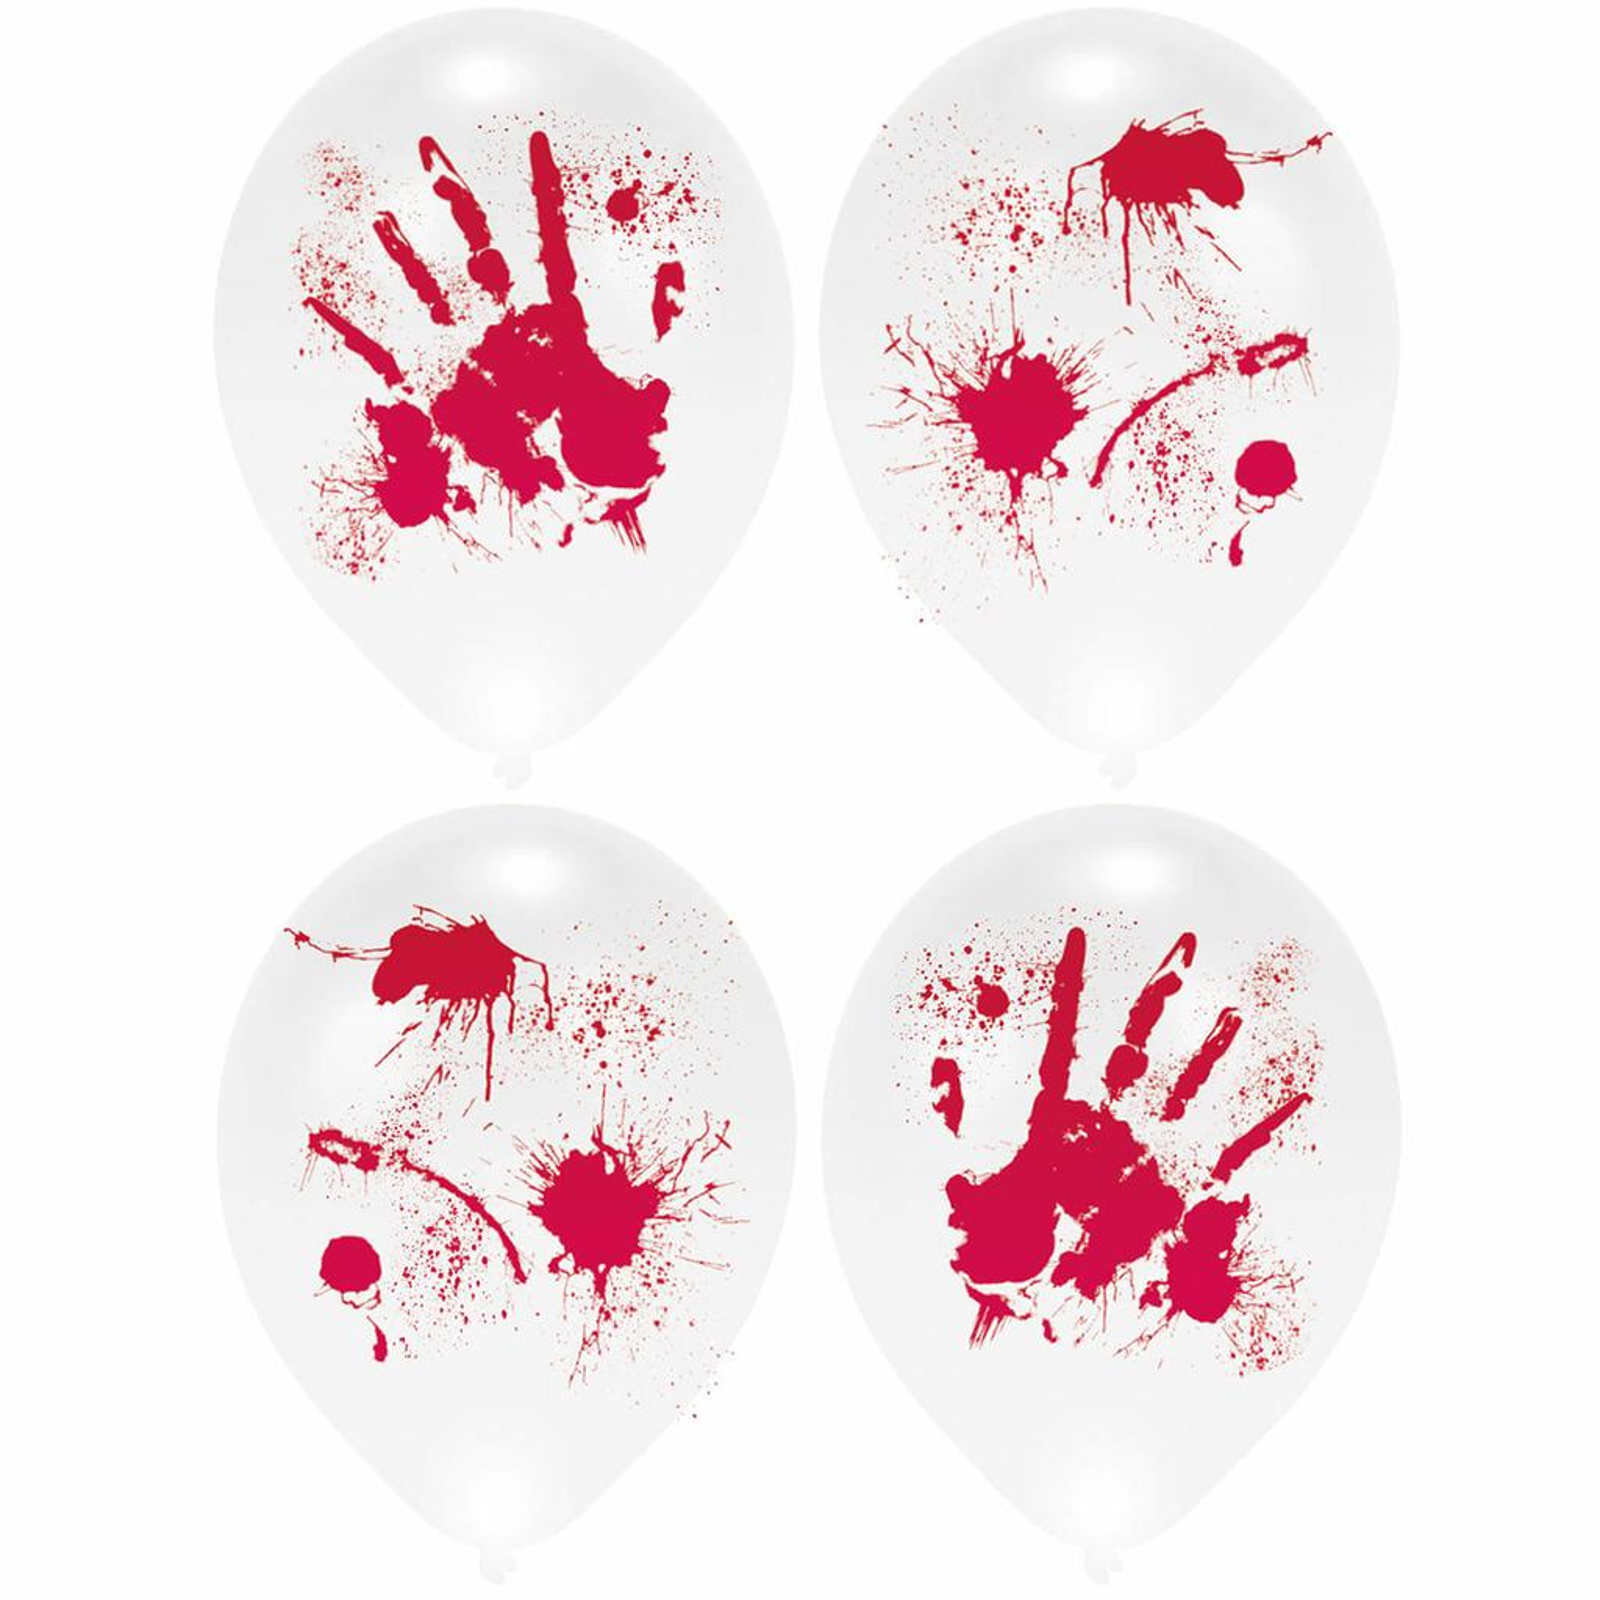 6 Halloween Deko Luftballons mit Blutflecken Halloweendeko Horror Dekoration